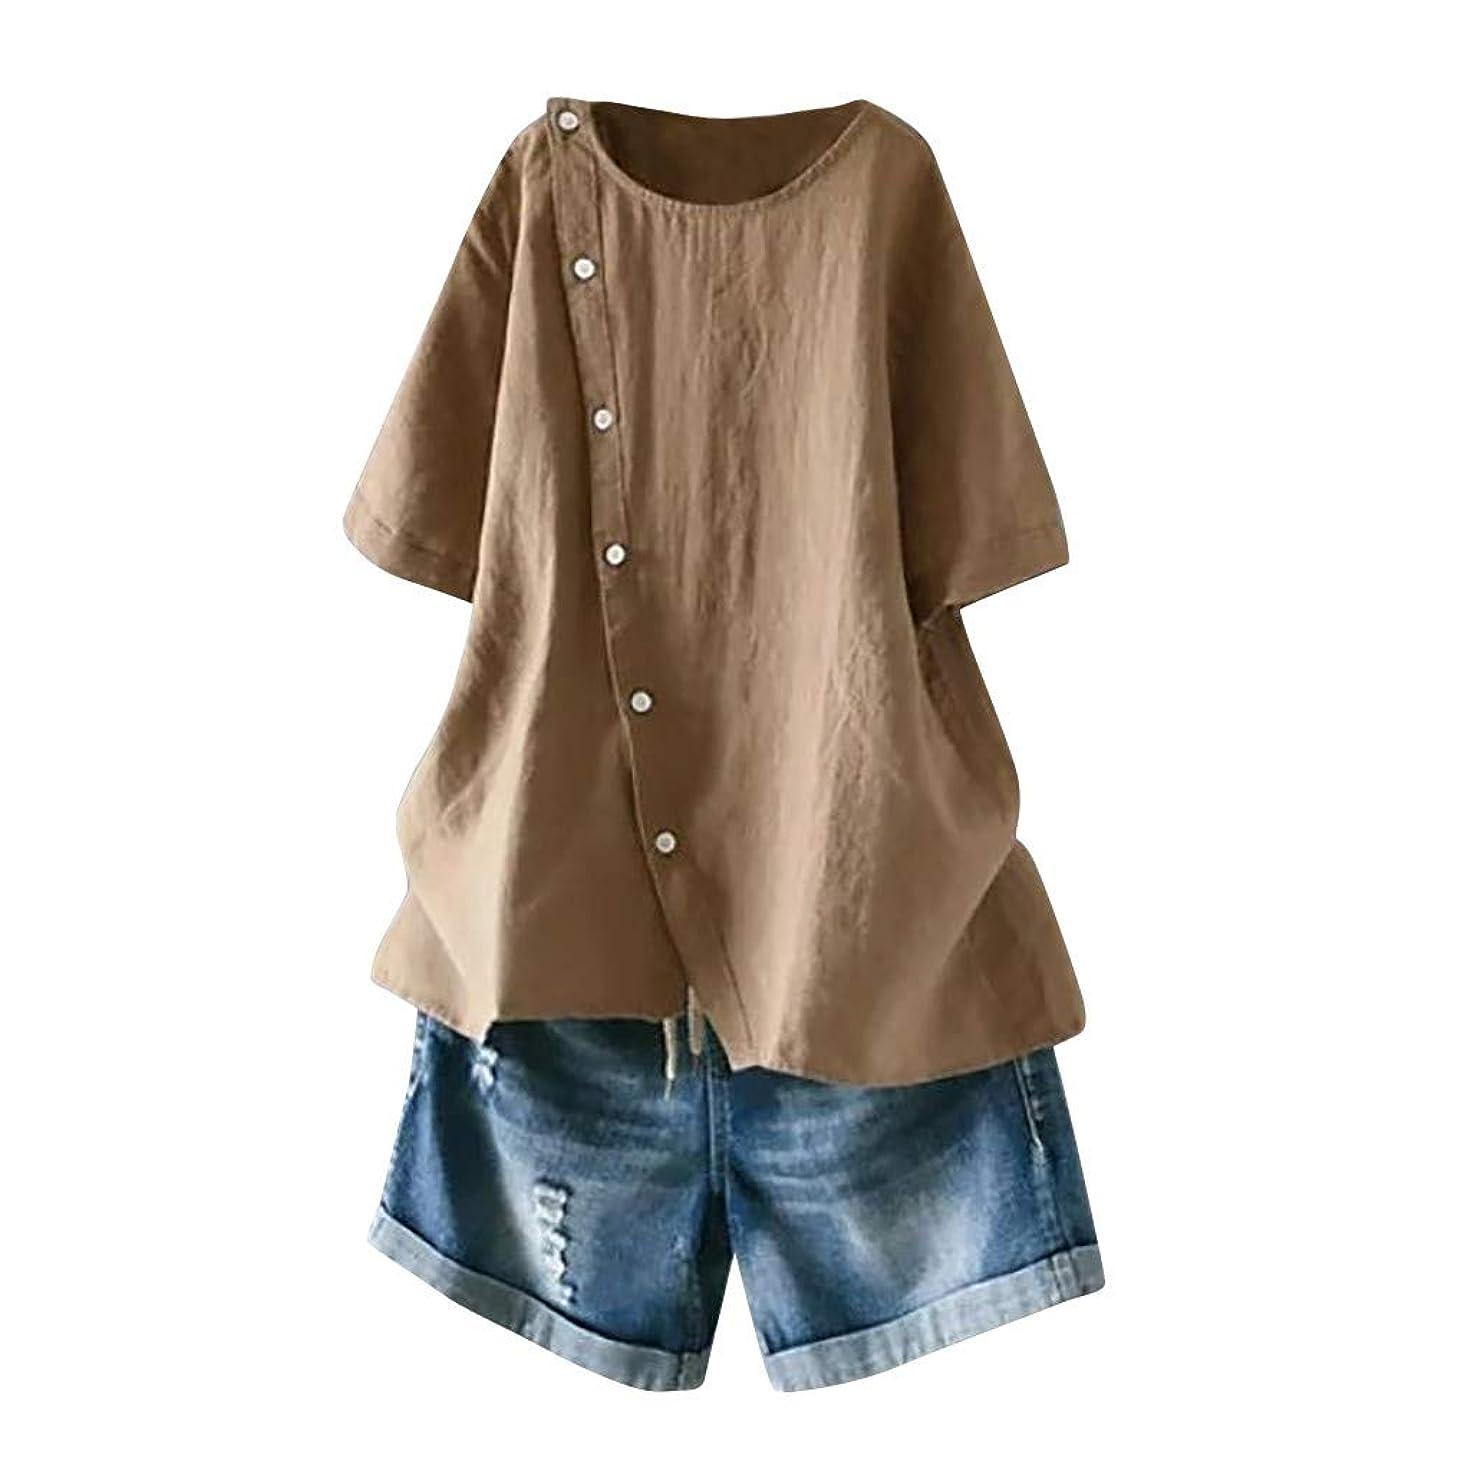 Cewtolkar Women Summer Tops Plus Size Blouse Cotton and Linen Tunic Button Tees O Neck T Shirt Short Sleeve Top